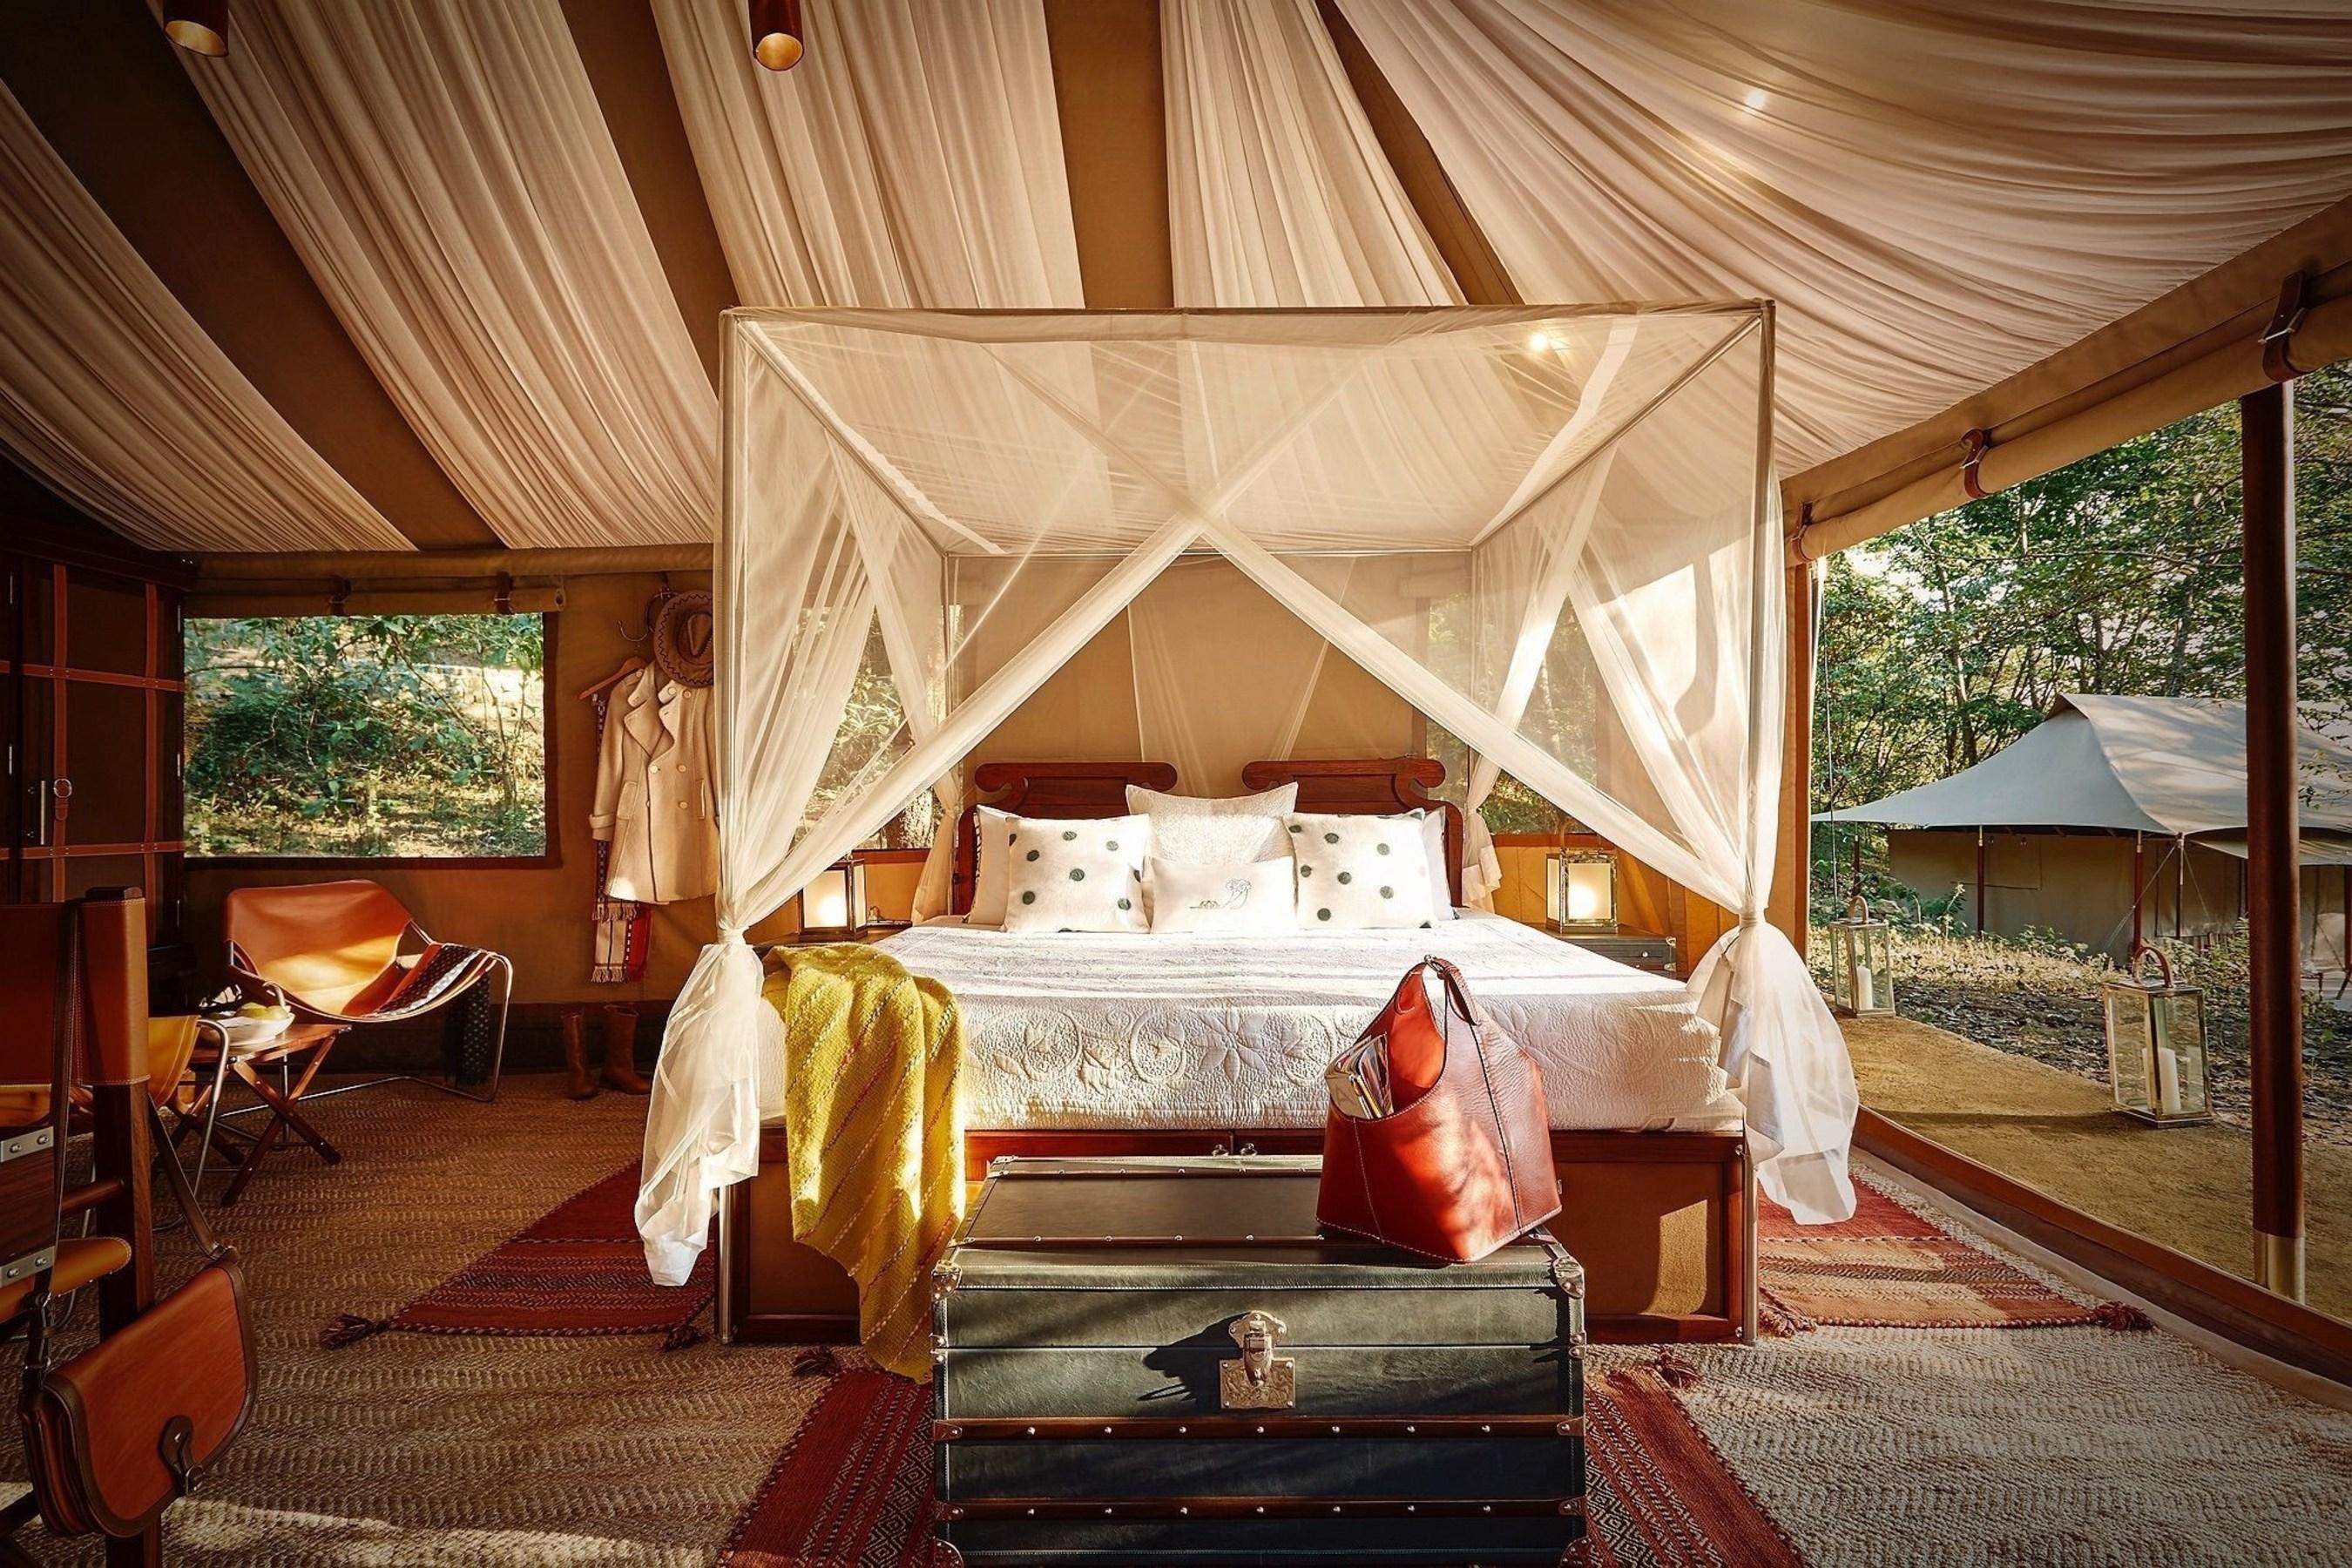 TUTC's luxurious camp in Kohima, Nagaland (PRNewsFoto/The Ultimate Travelling Camp)